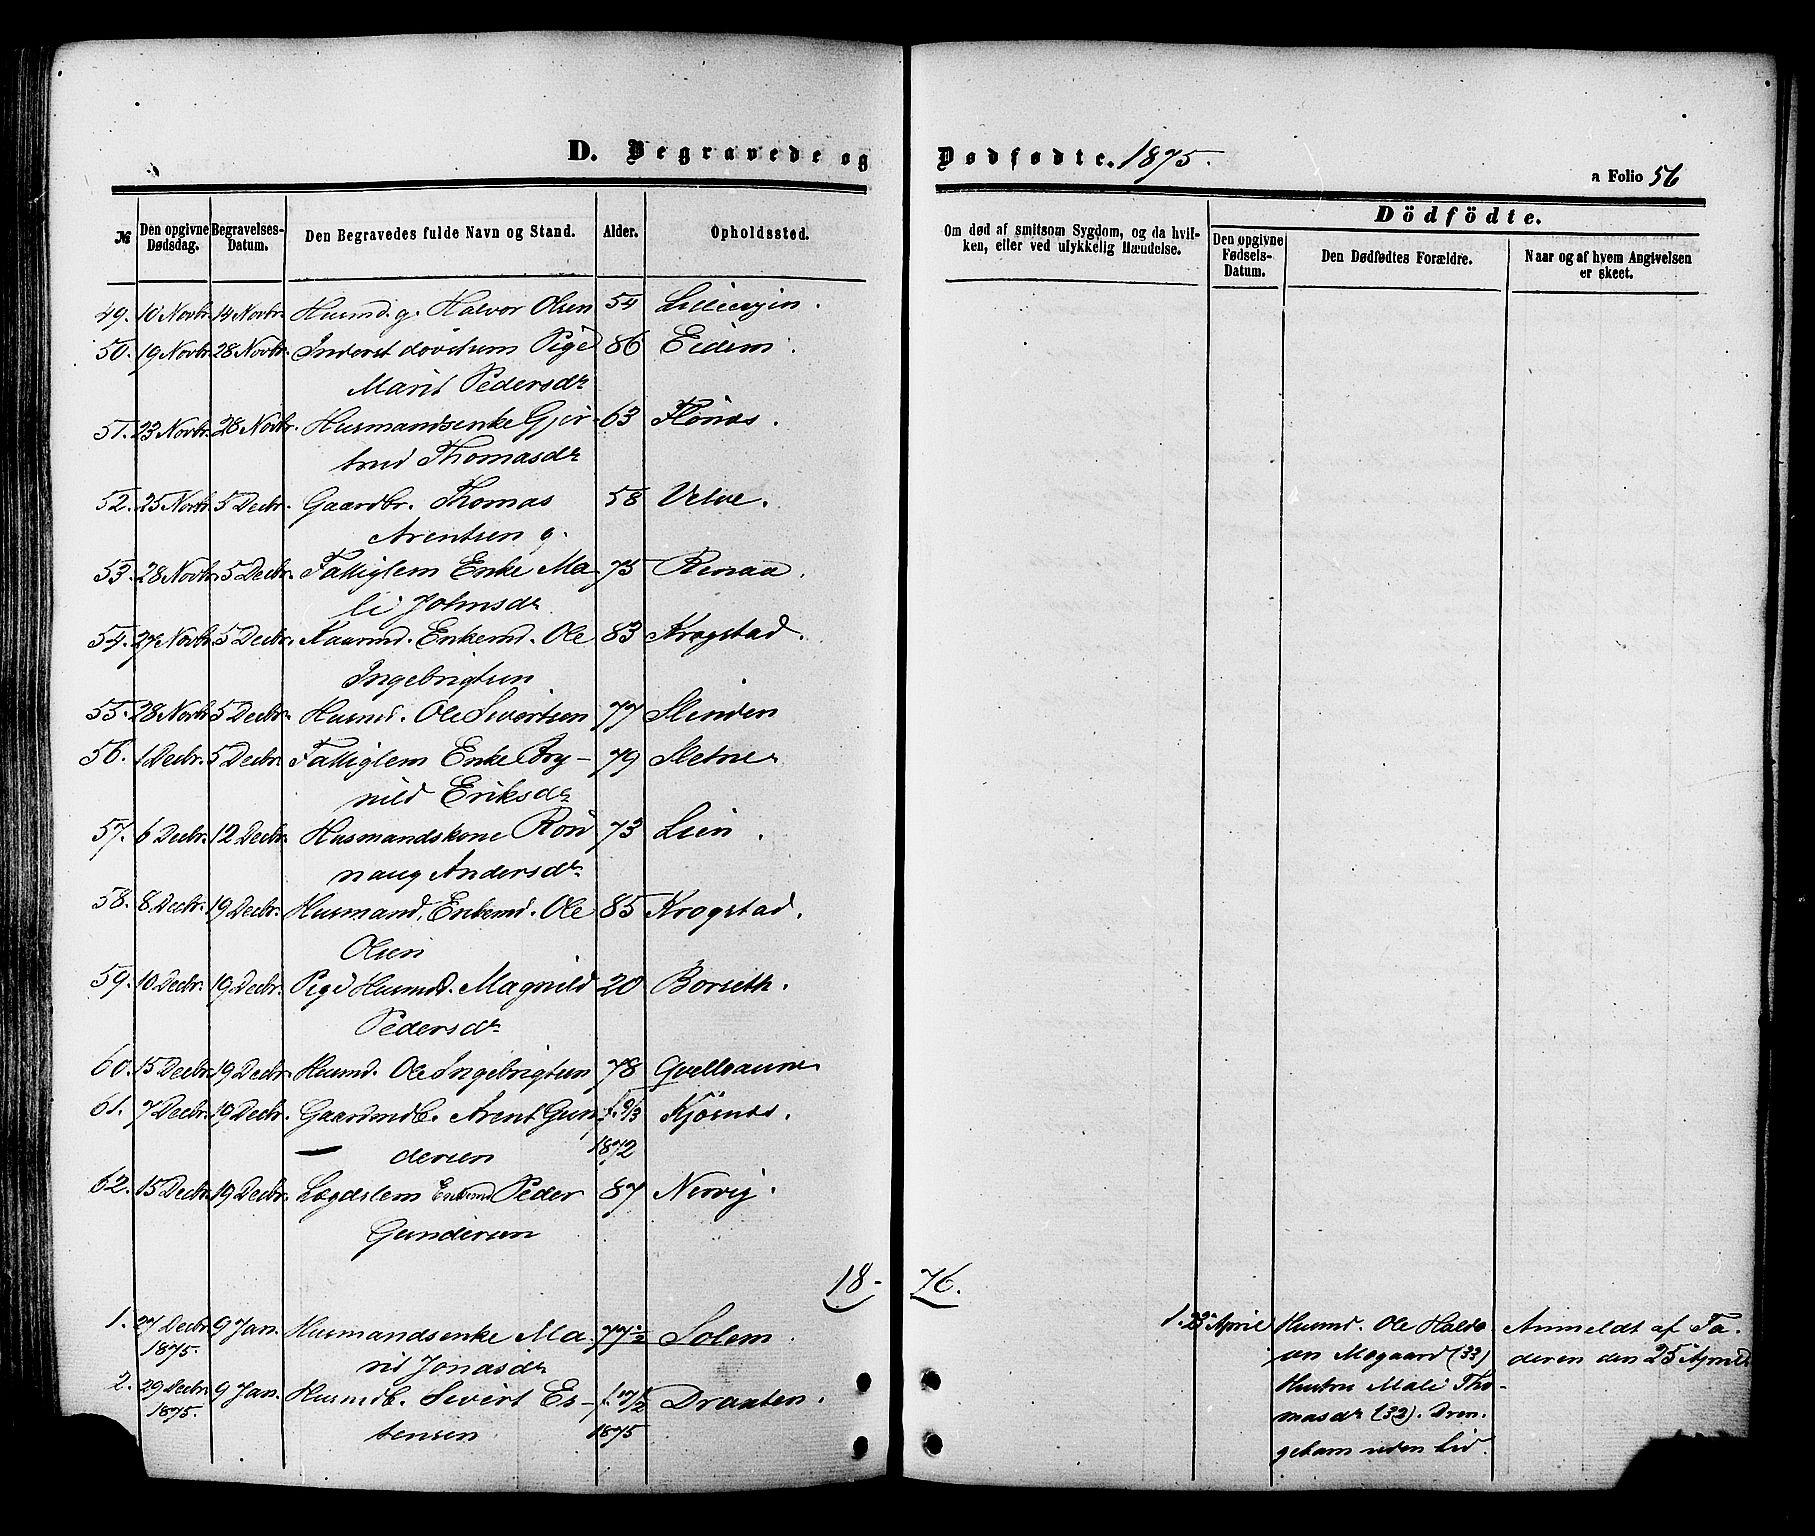 SAT, Ministerialprotokoller, klokkerbøker og fødselsregistre - Sør-Trøndelag, 695/L1147: Parish register (official) no. 695A07, 1860-1877, p. 56